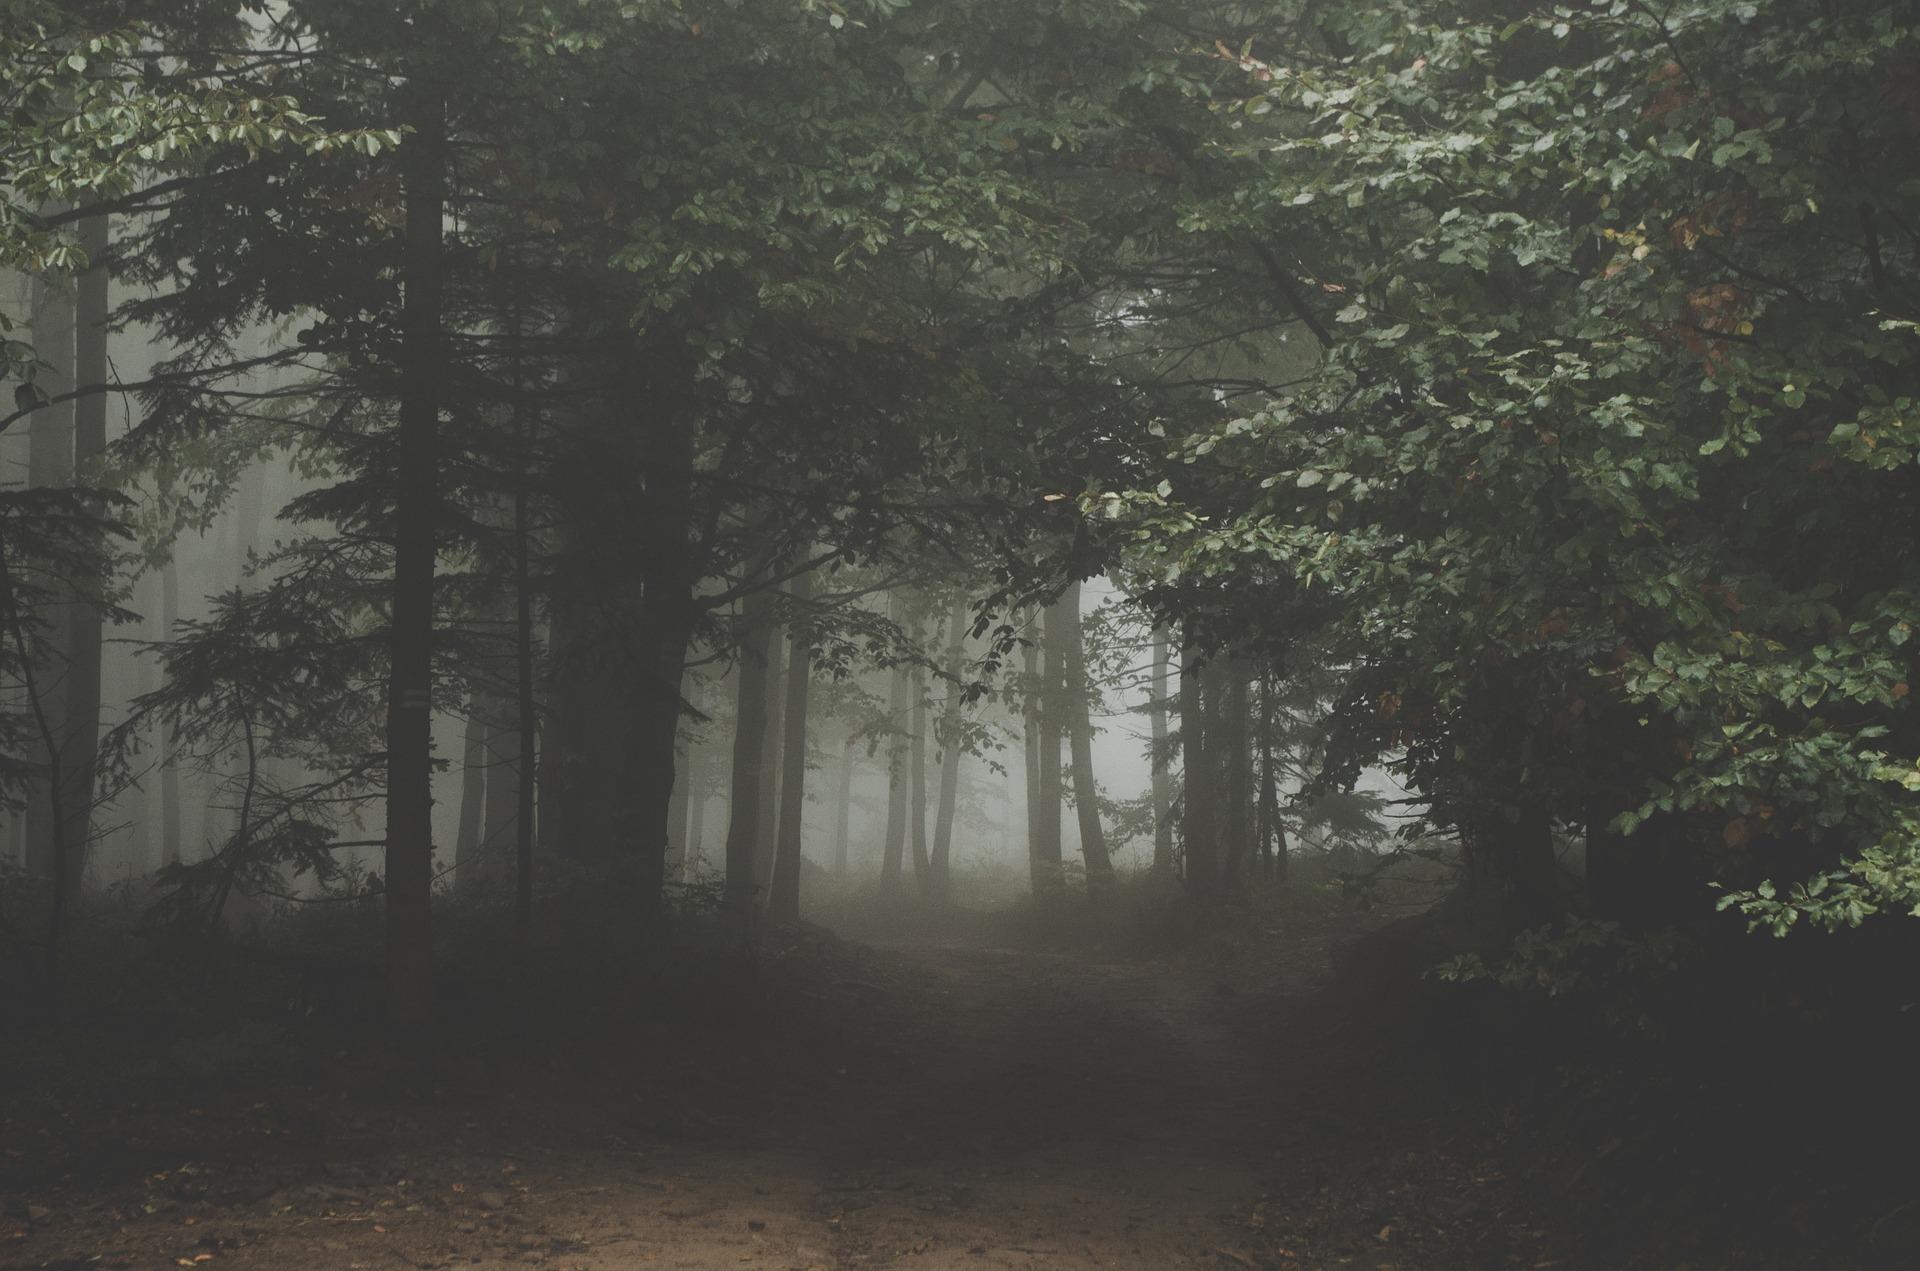 forest-1031022_1920.jpg